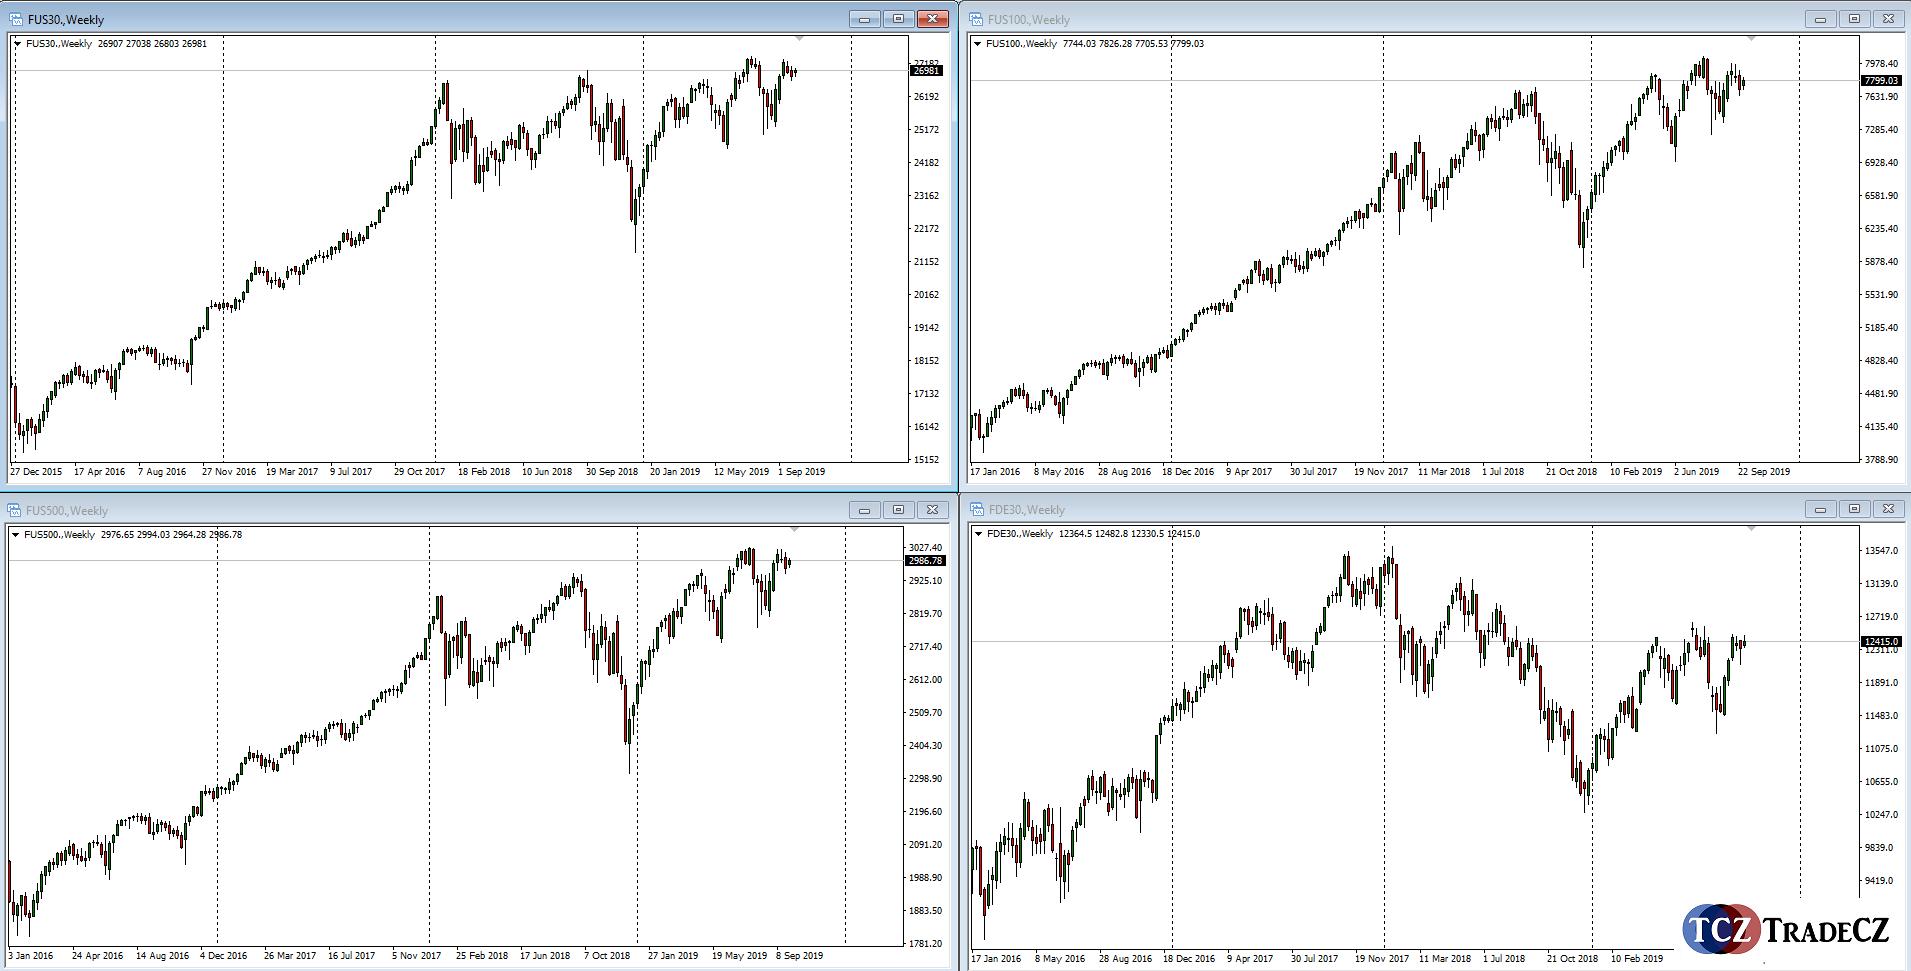 Akcioé indexy DJIA, NASDAQ, SP500 a DAX